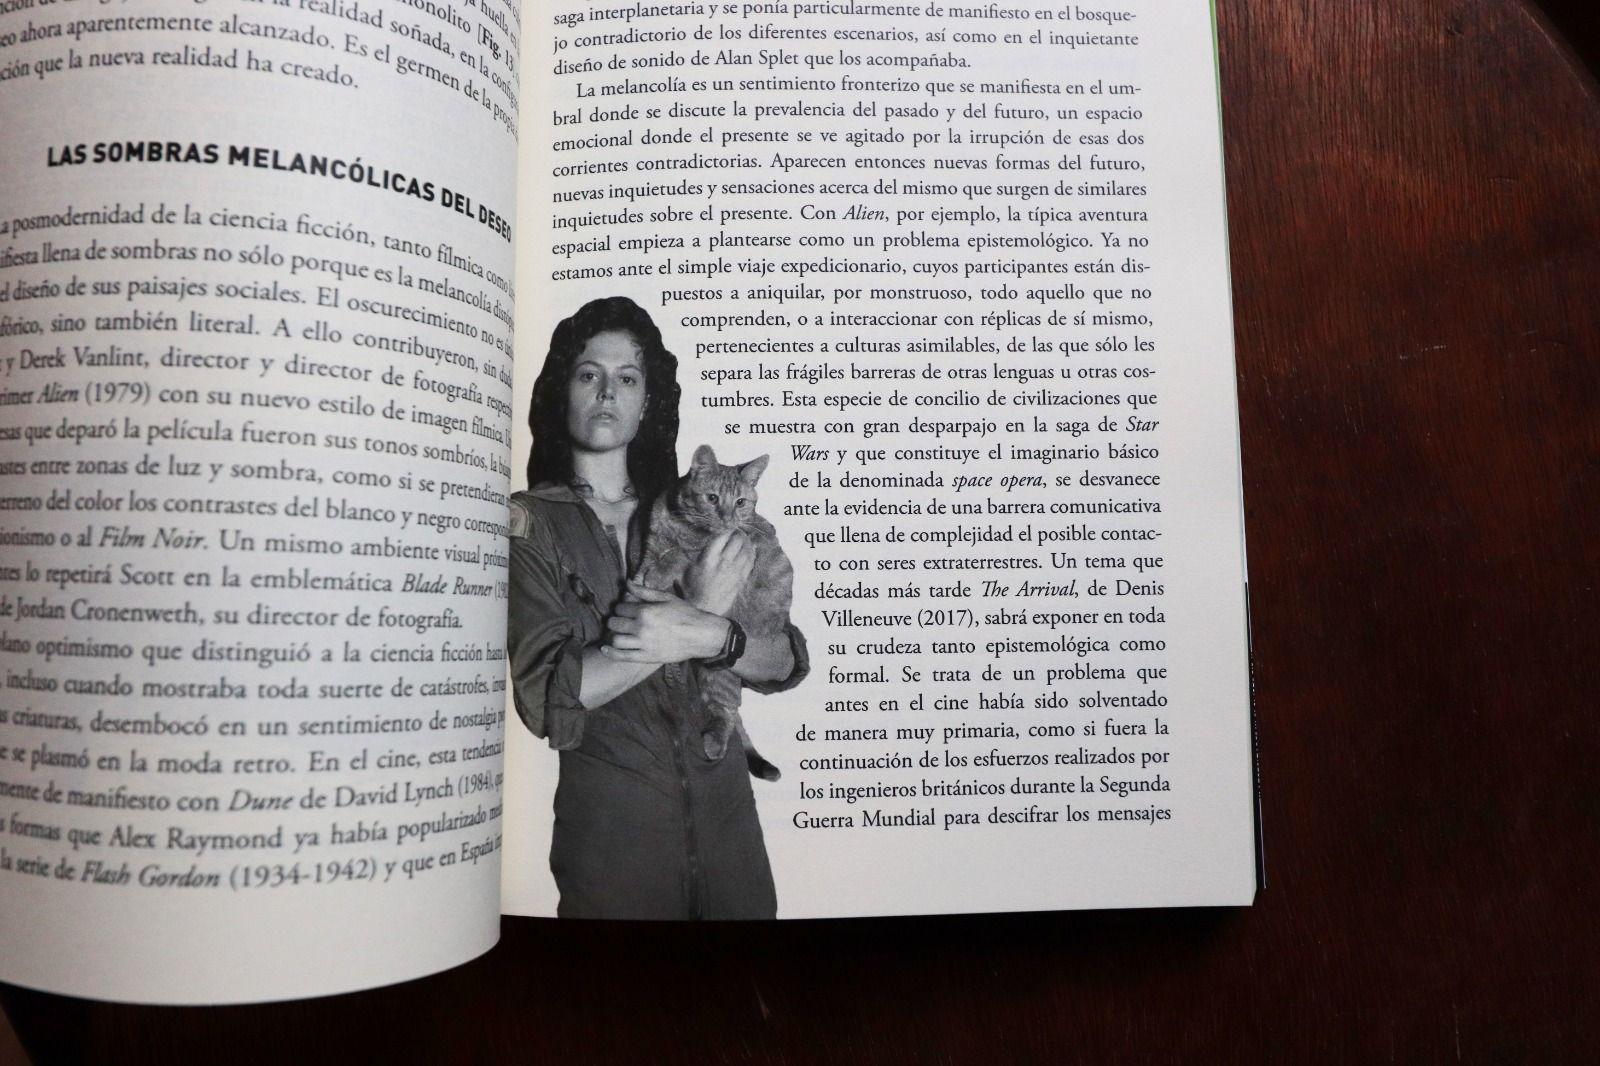 Imaginar Mundos – Sans Soleil Ediciones 2019-05-14 at 19.45.44 (8)